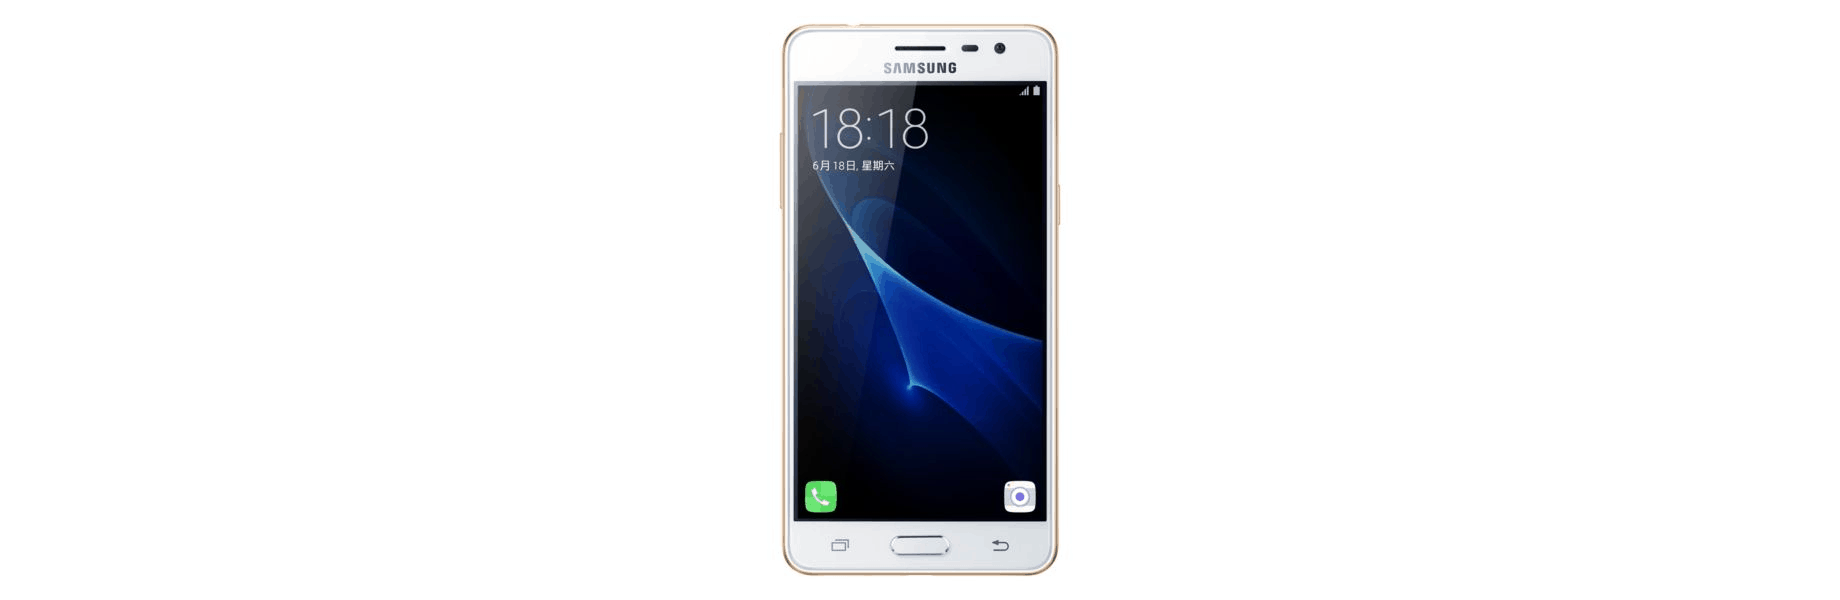 Samsung Galaxy J3 Pro 11